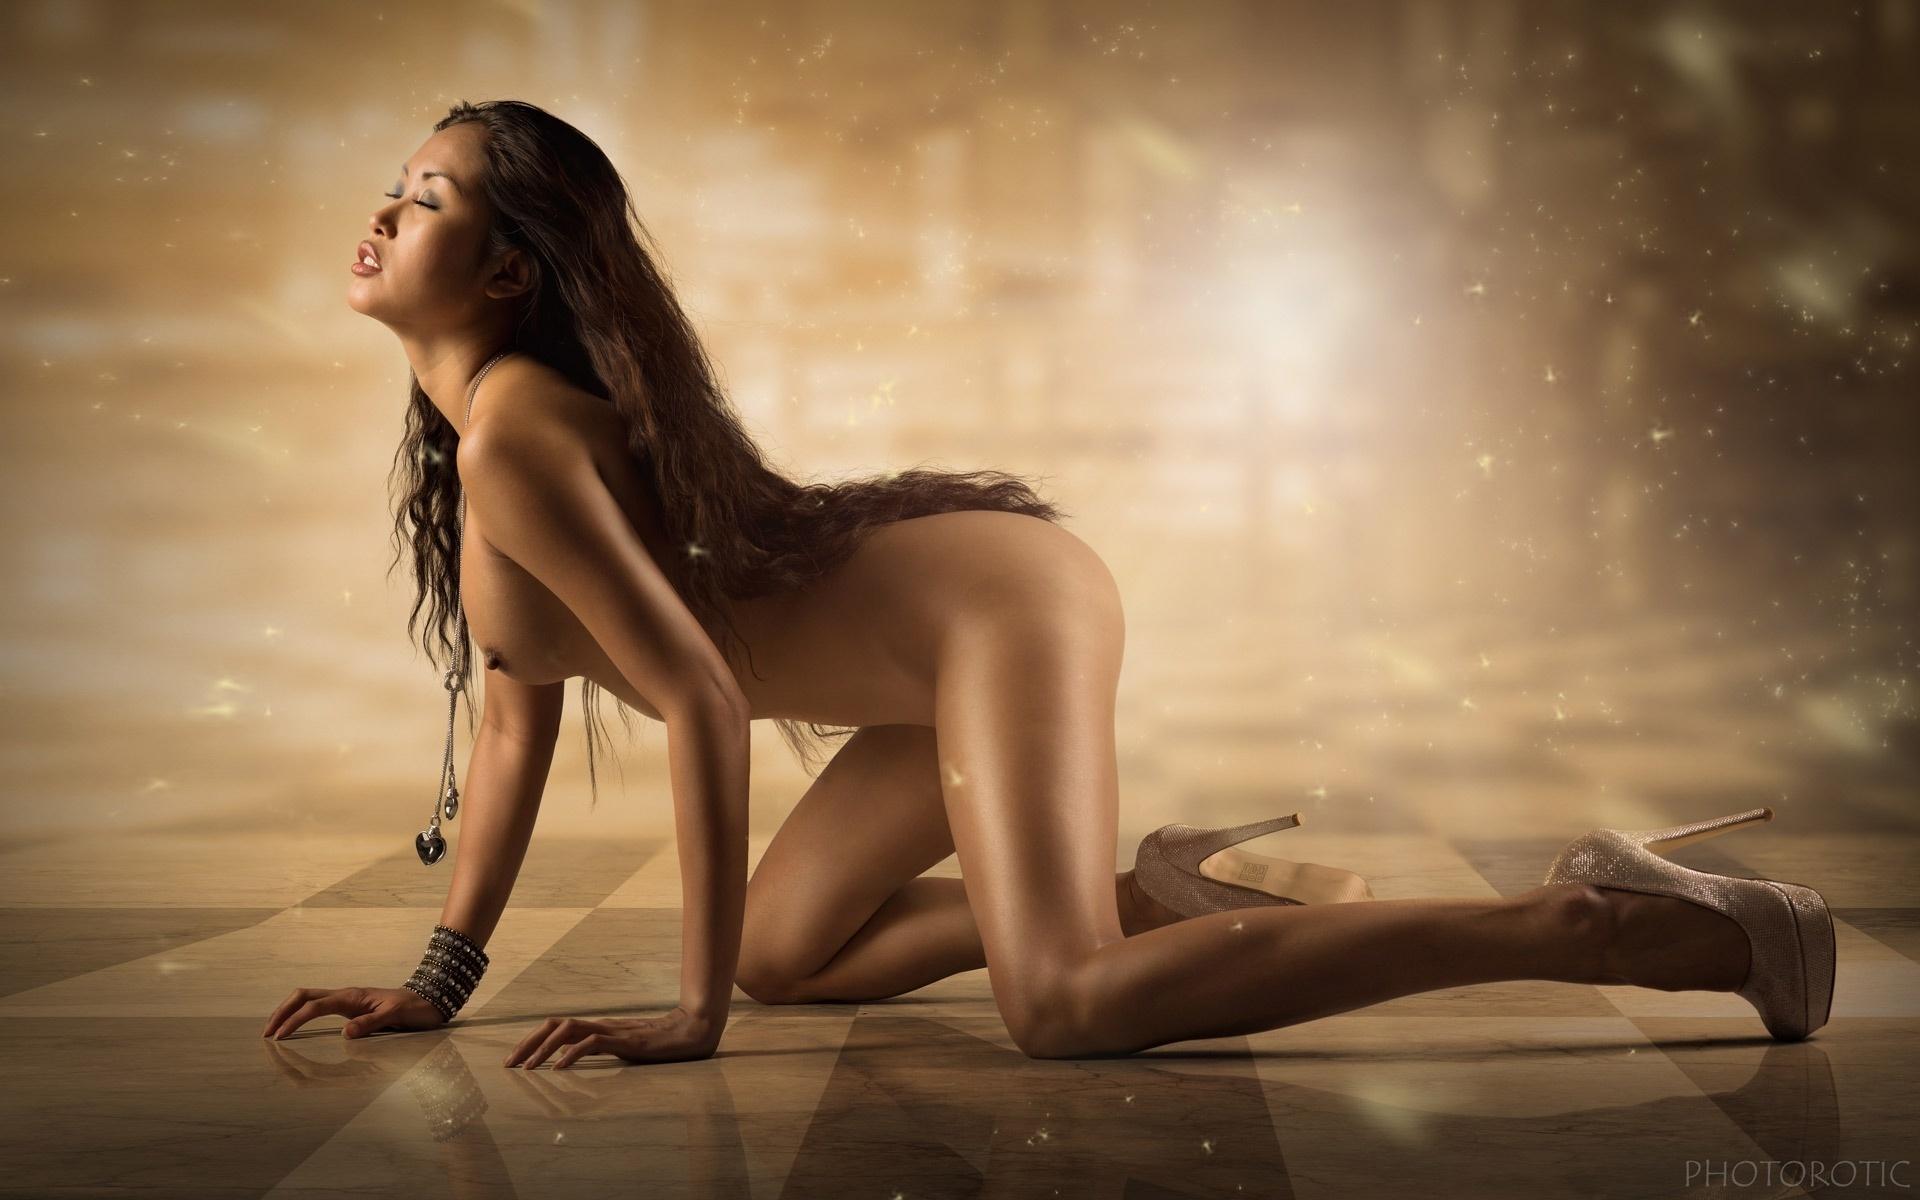 Erotic girls willpapers image 6